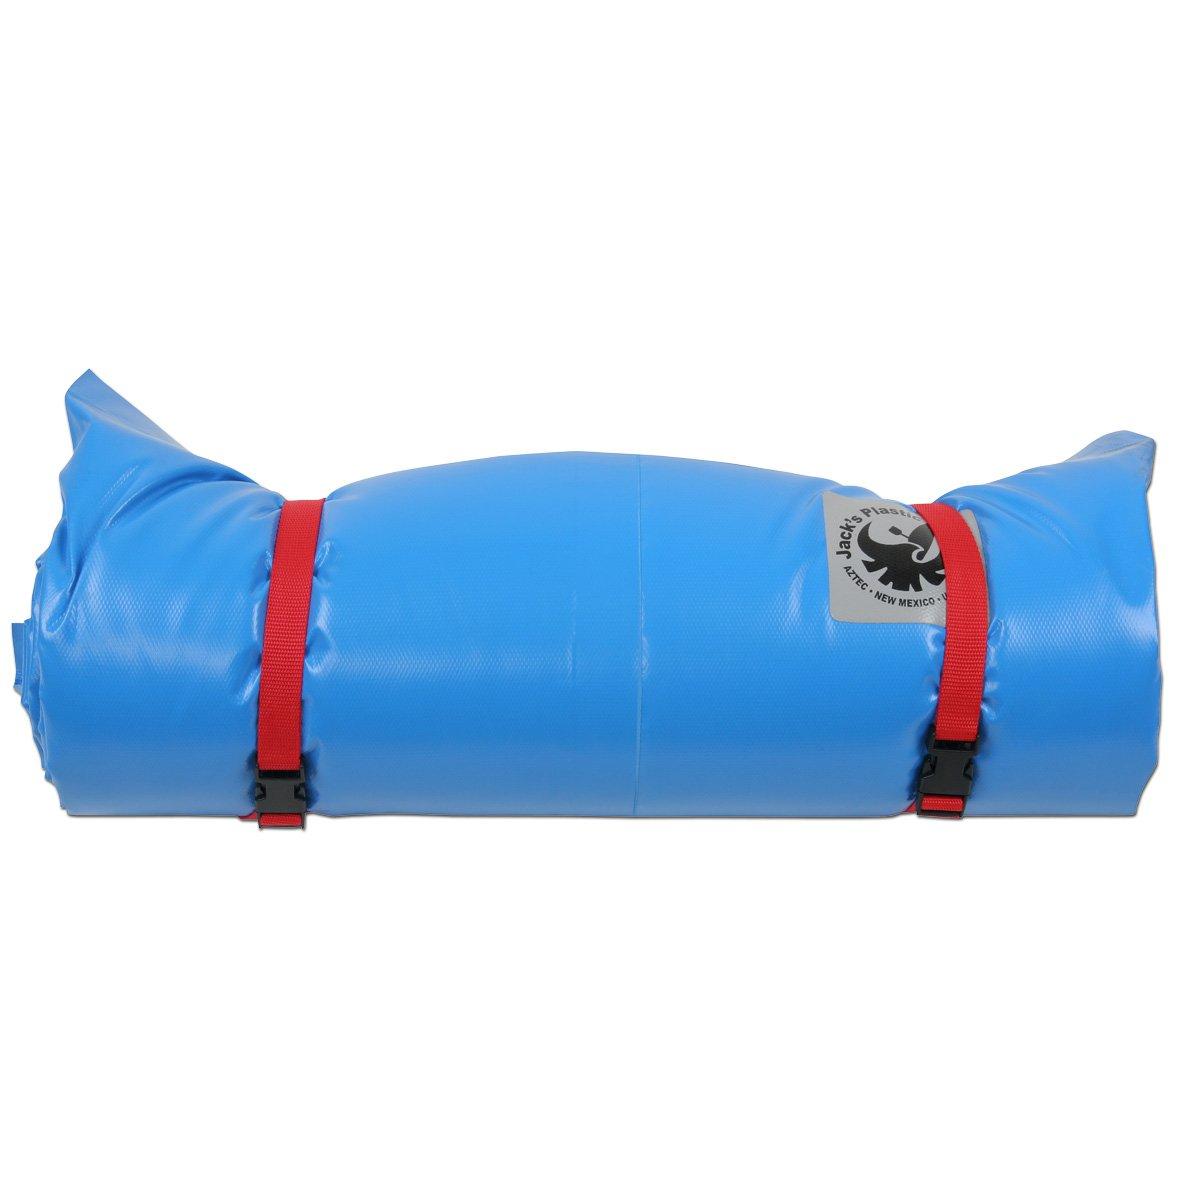 JACK S PLASTIC Super Paco Sleeping Pad